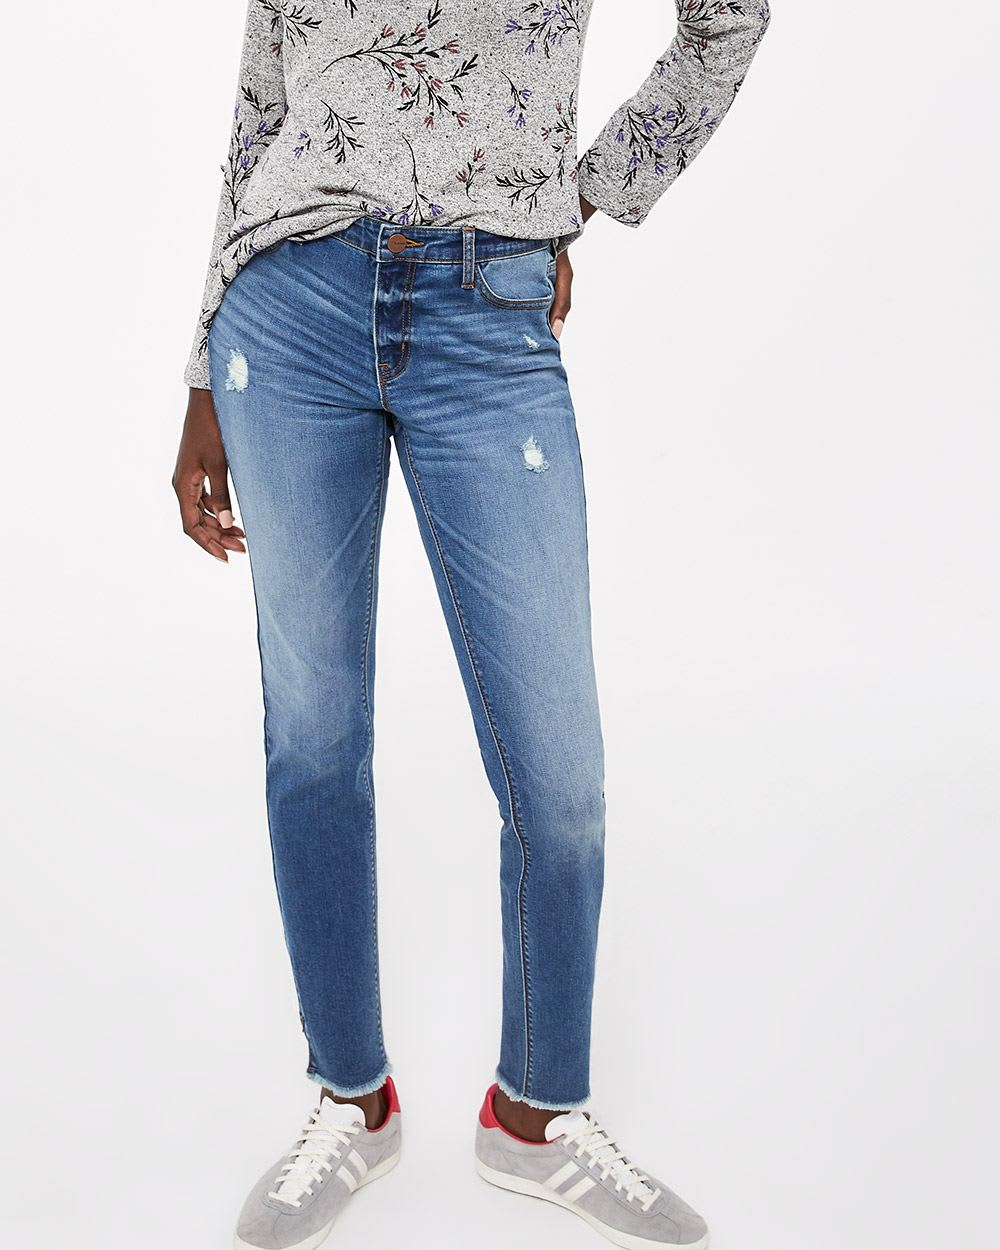 jeans skinny d lav moyen avec fermeture clair r gulier reitmans. Black Bedroom Furniture Sets. Home Design Ideas